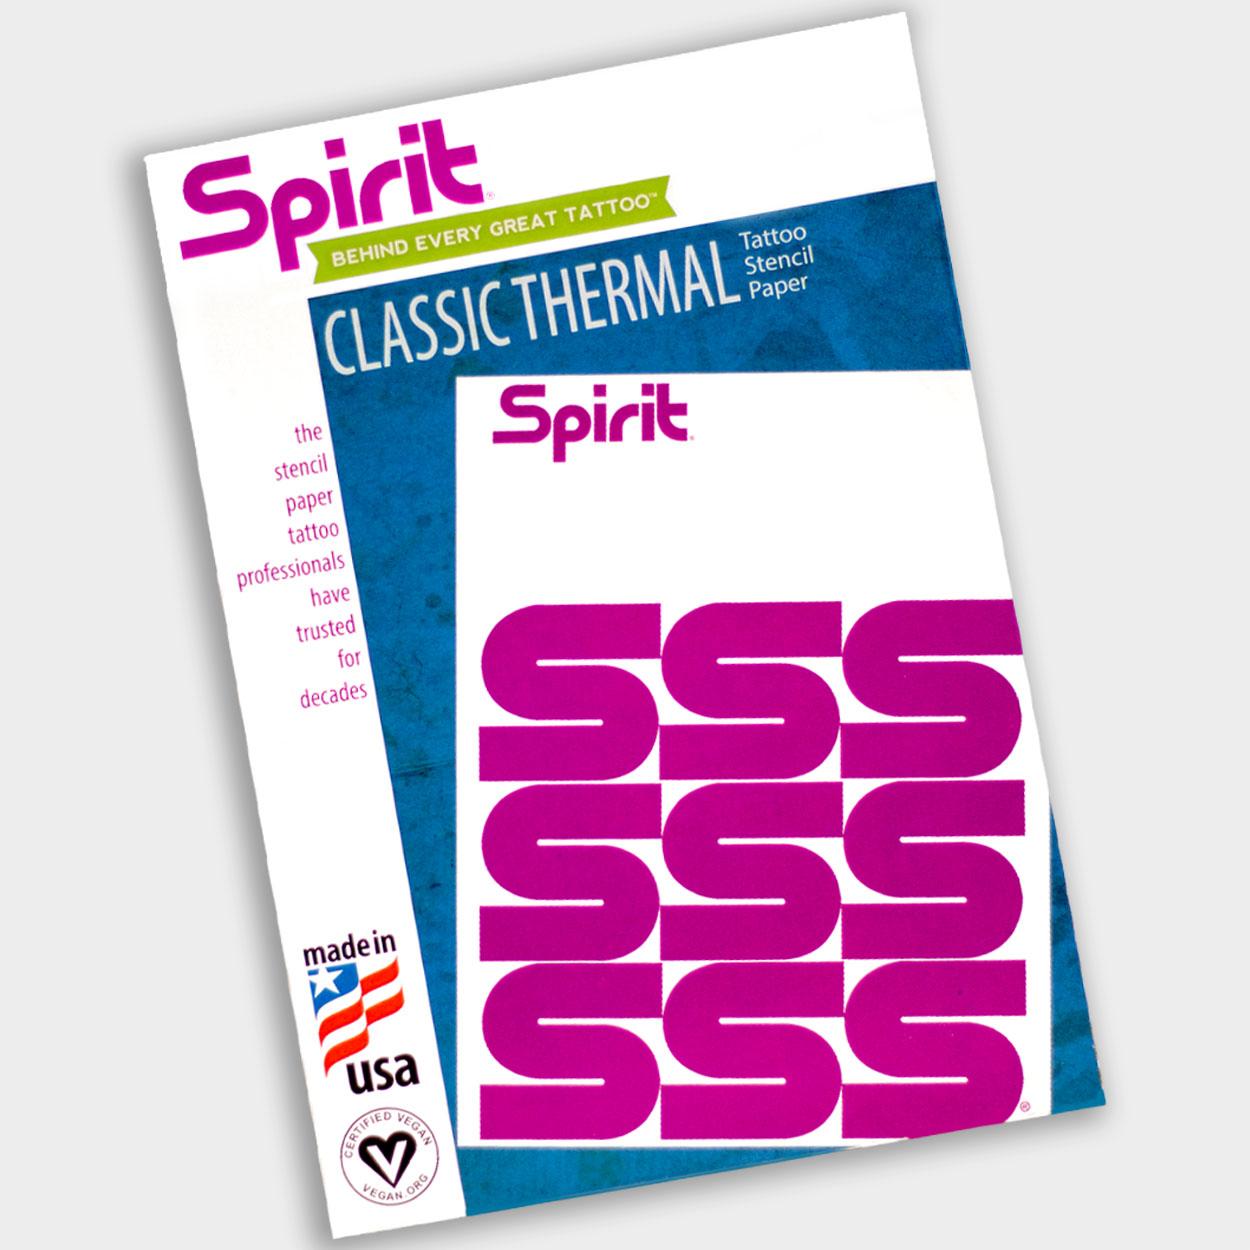 Classic Thermal Tattoo Stencil Transfer Paper - Spirit - Killer Silver